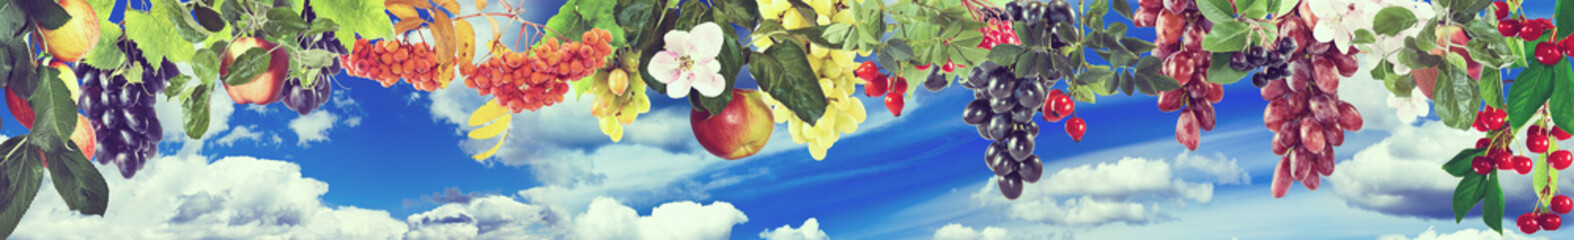 Image of sweet apples, grapes,raspberries and cherries